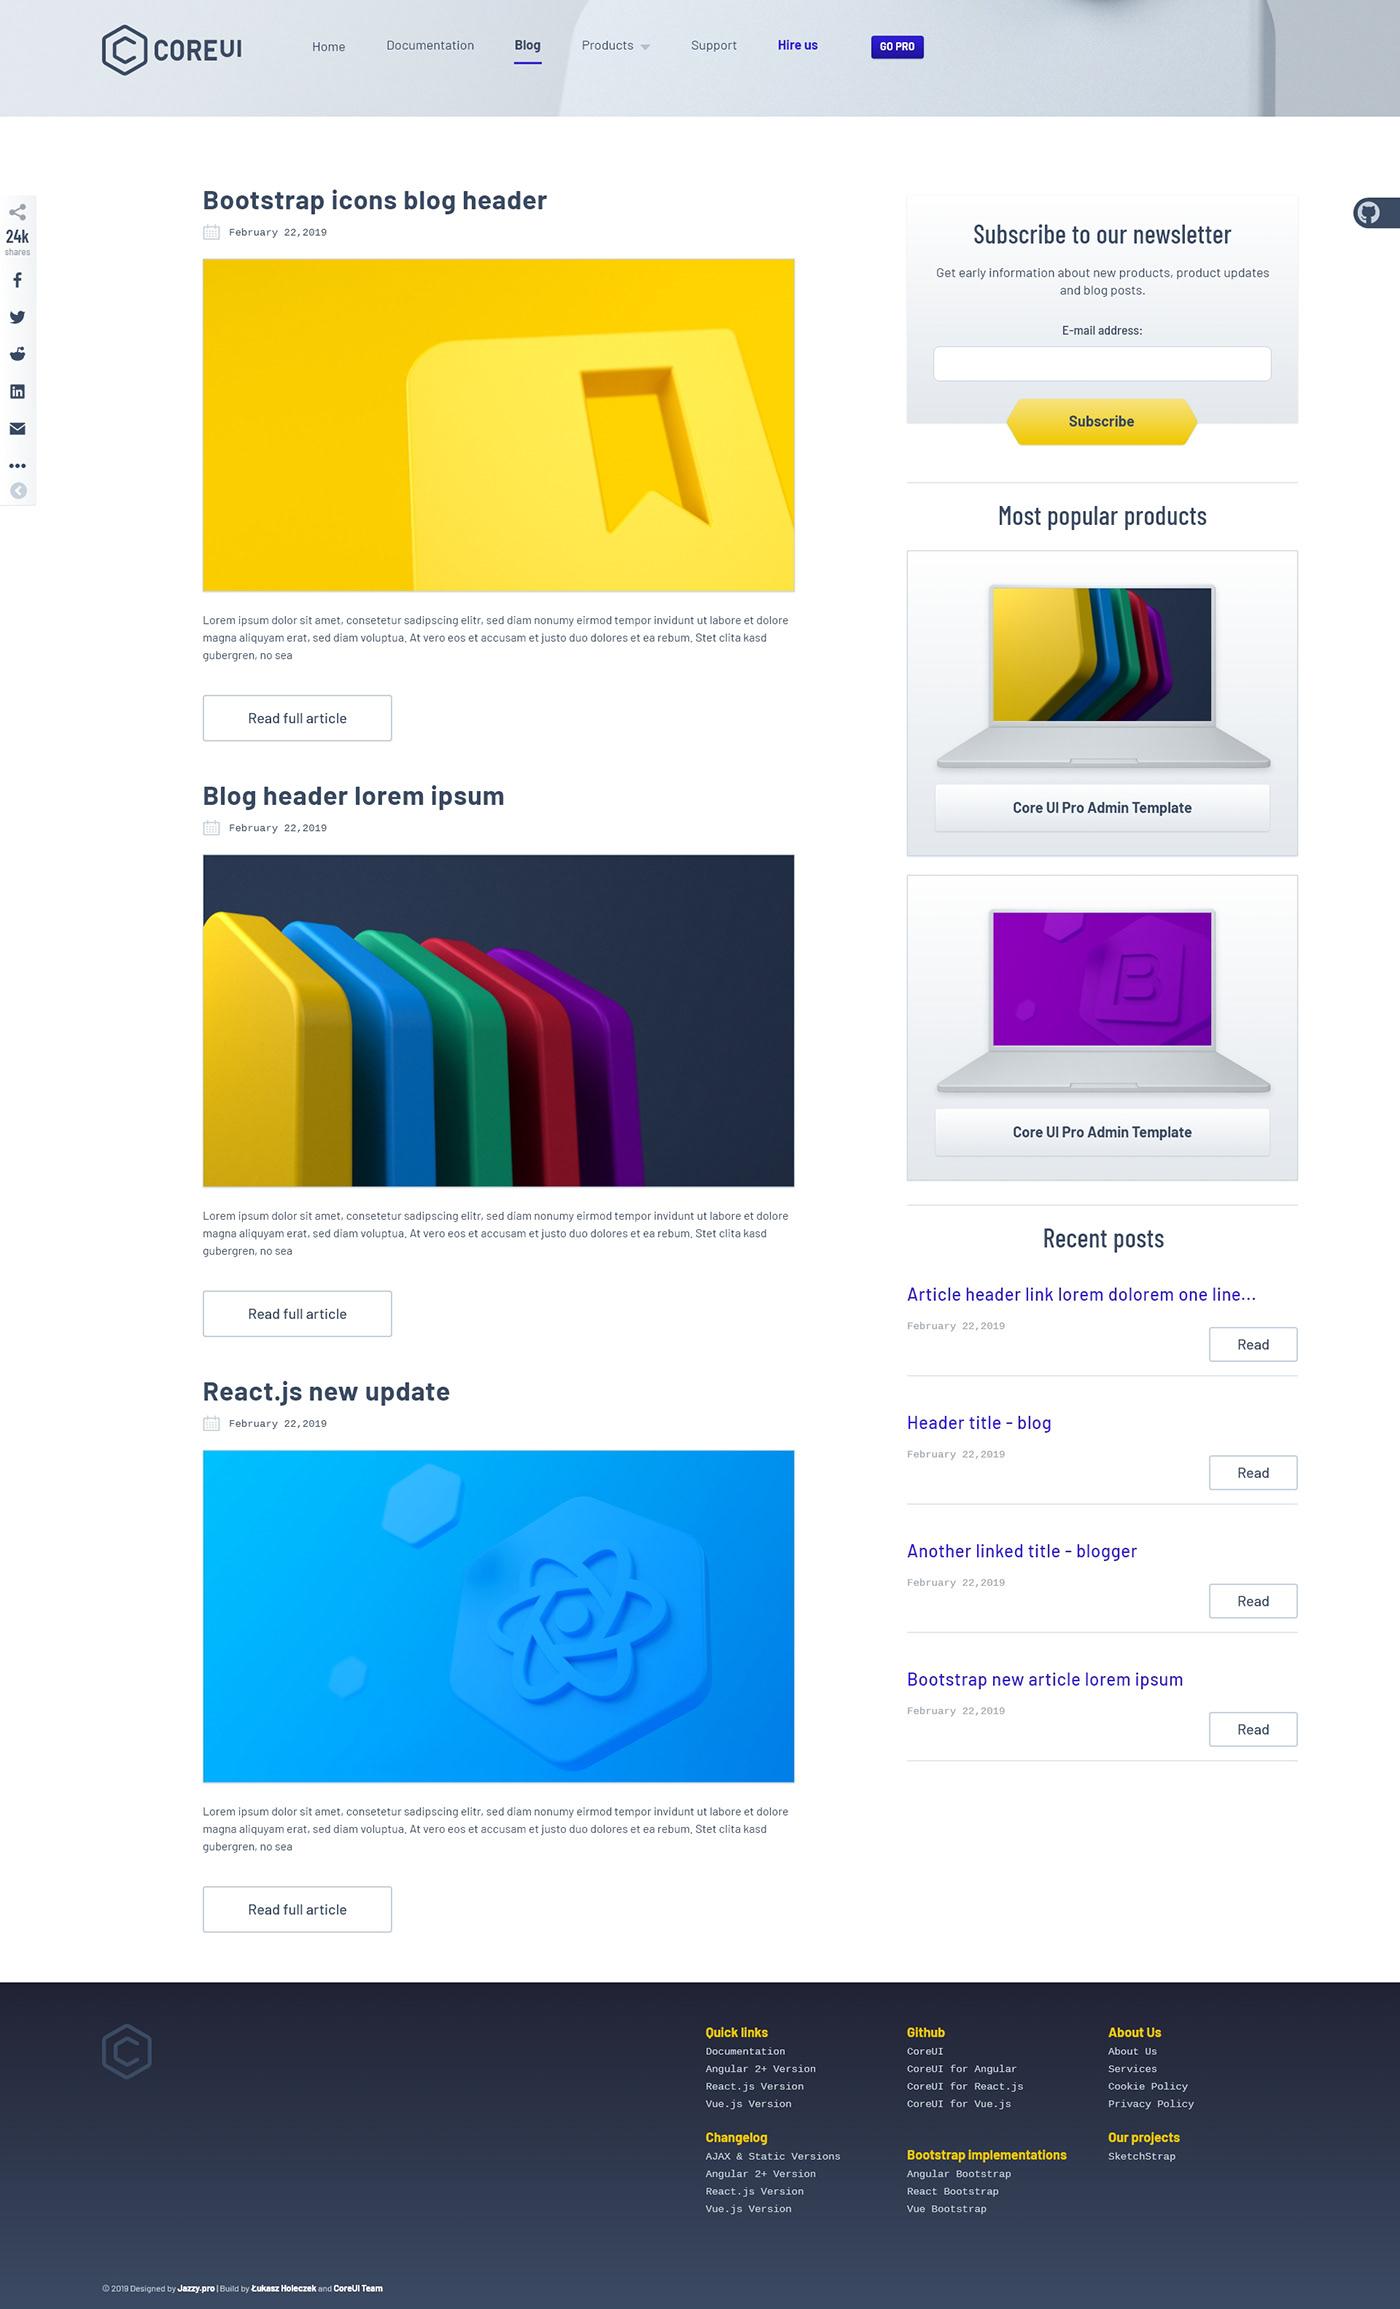 CoreUI: Rebrand and Web on Pantone Canvas Gallery